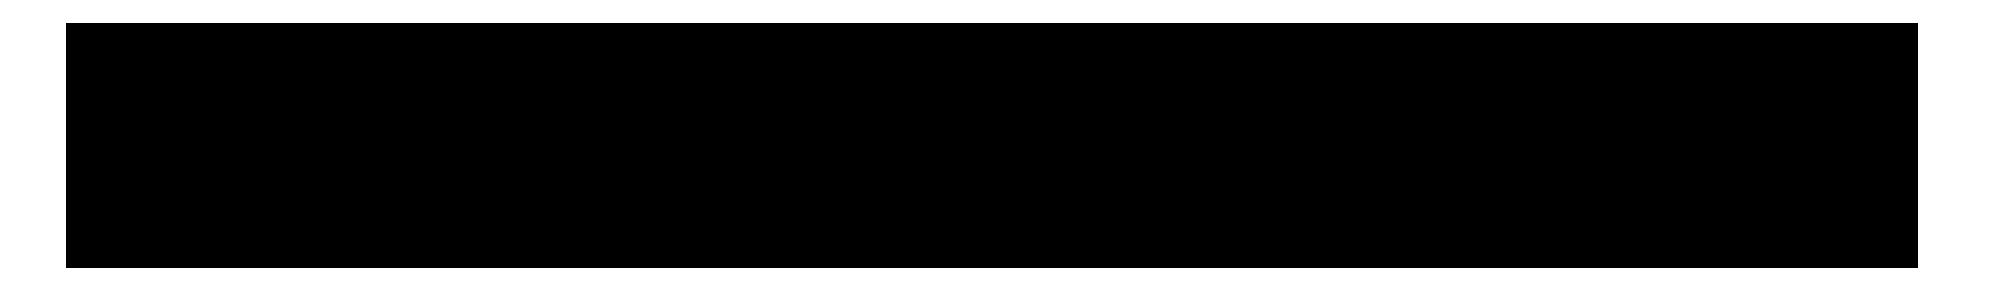 paramusbagel